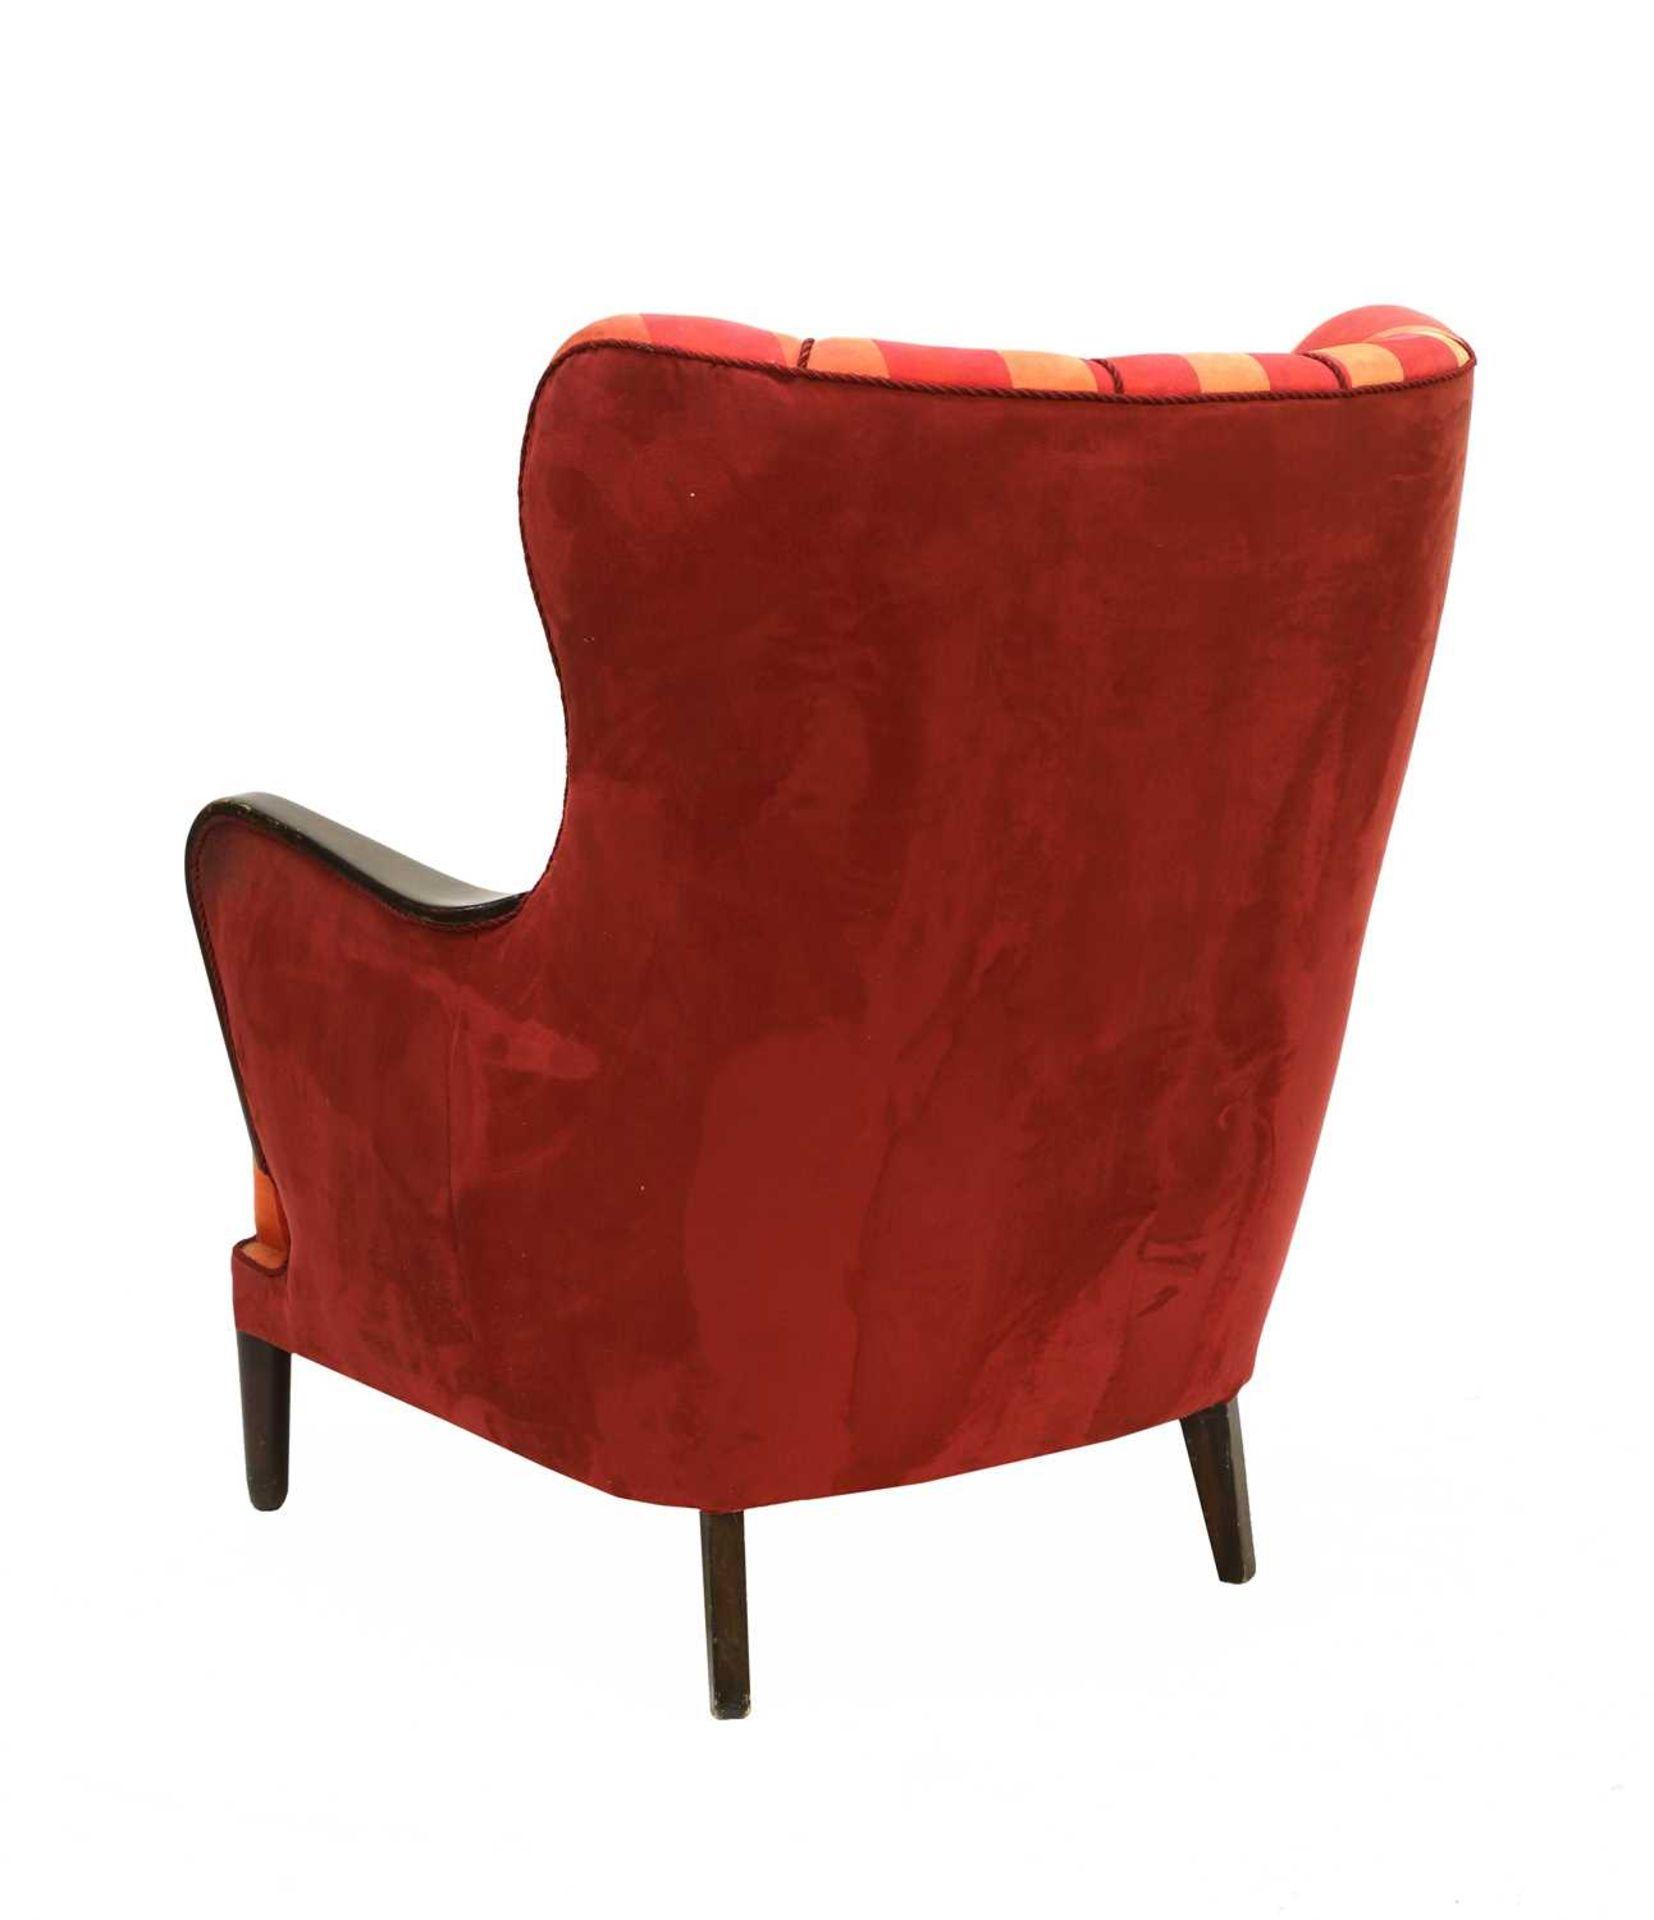 A Danish armchair, - Image 2 of 3